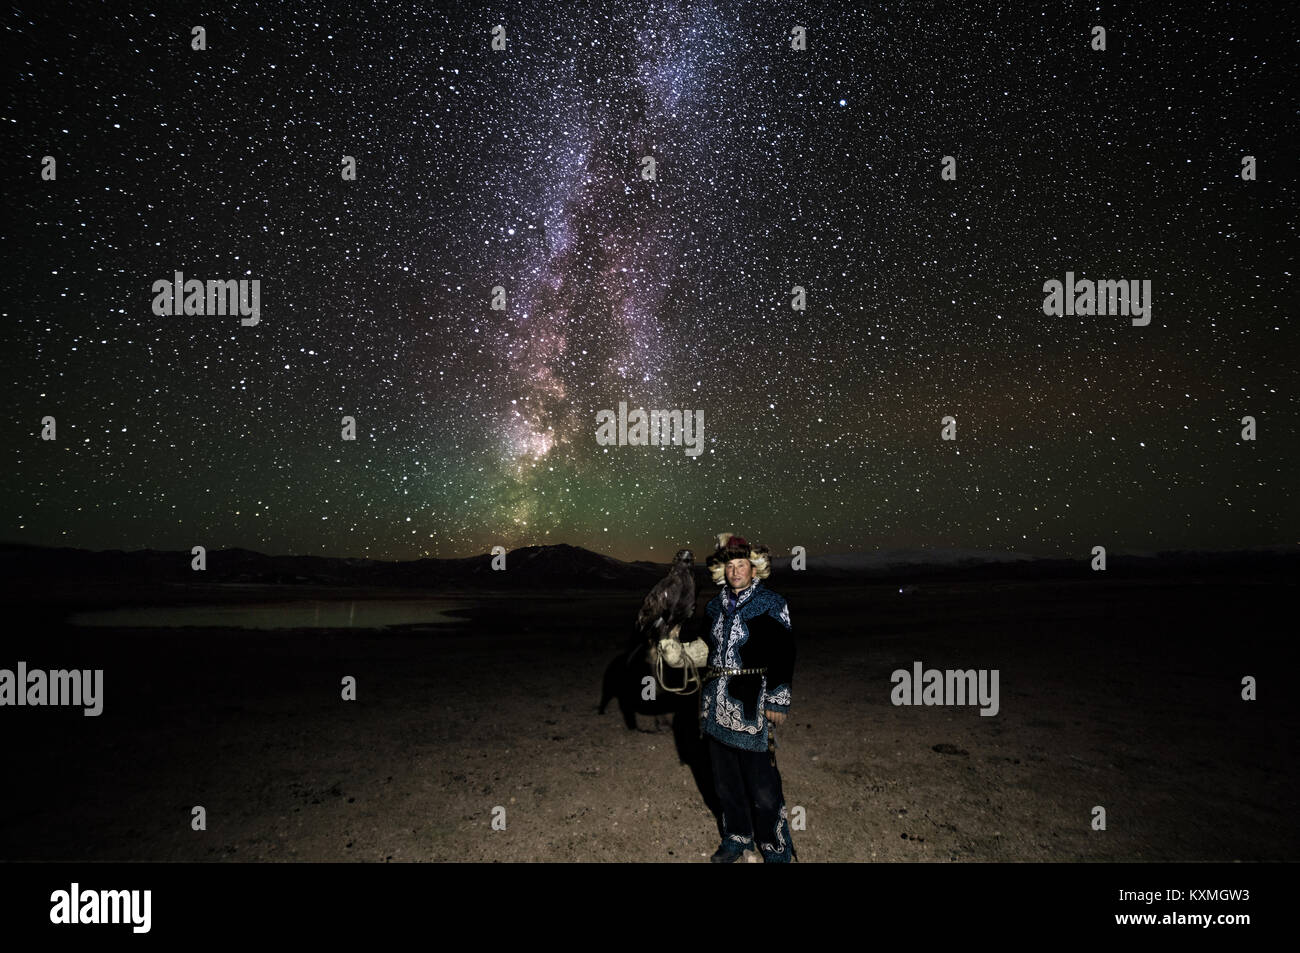 Milky way nightsky astrophotography nightscape stars golden eagle hunter Mongolia kazakh - Stock Image